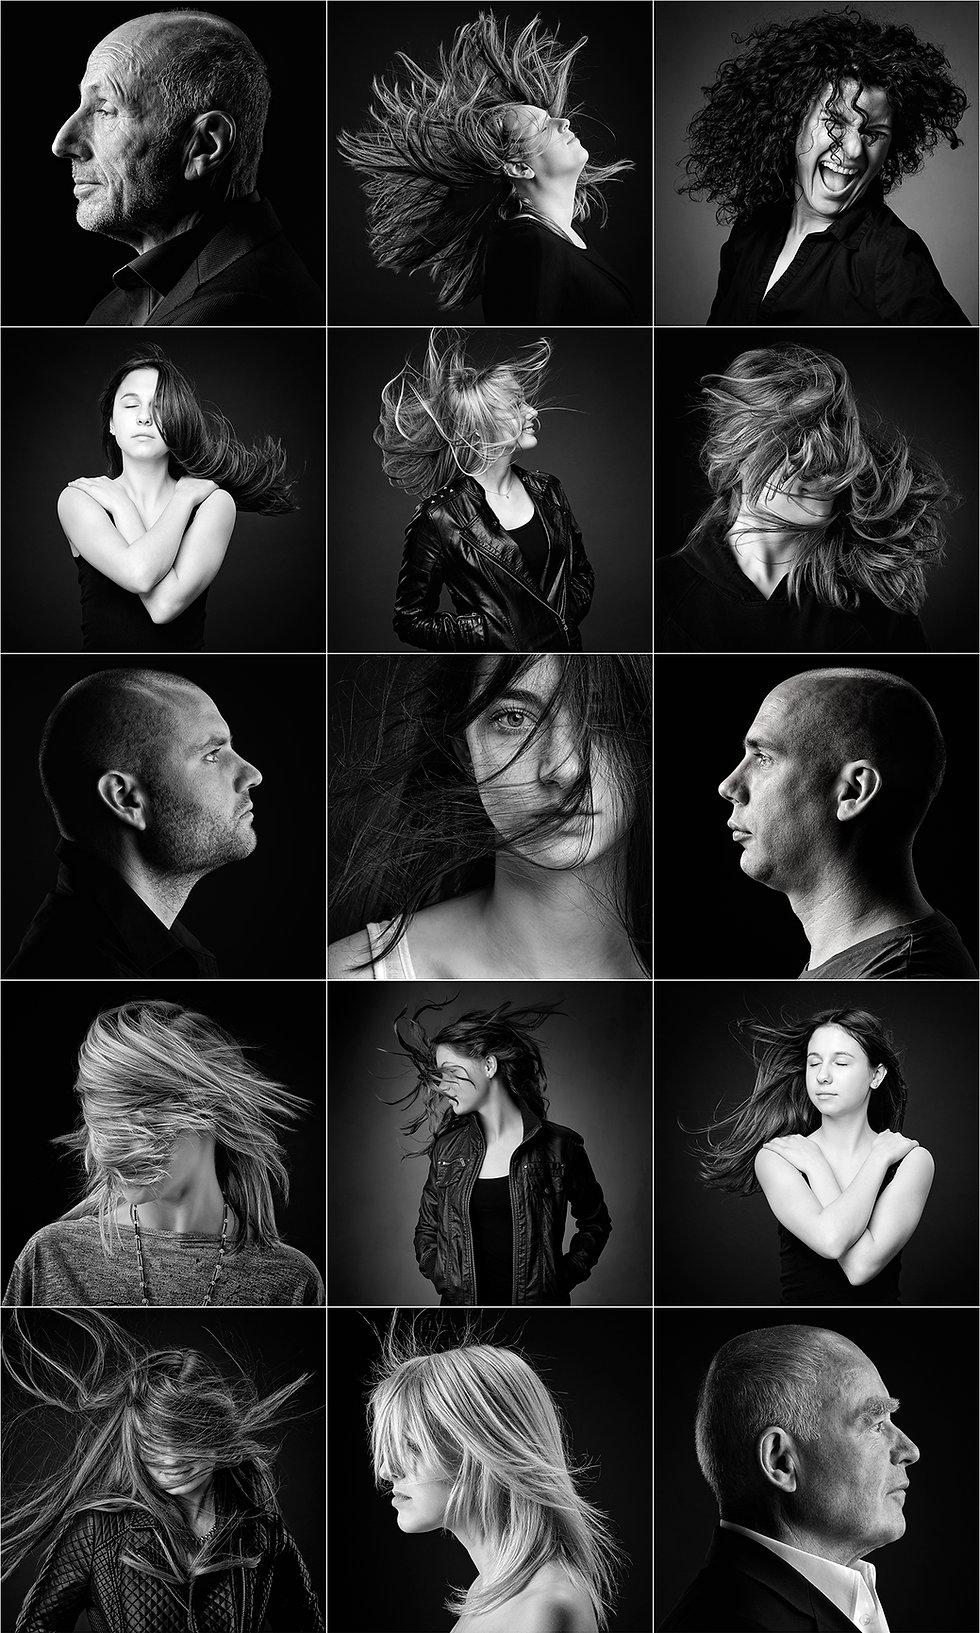 Headshots, black & white, International Photographic Qualifications, Bund professioneller Portraitfotografen